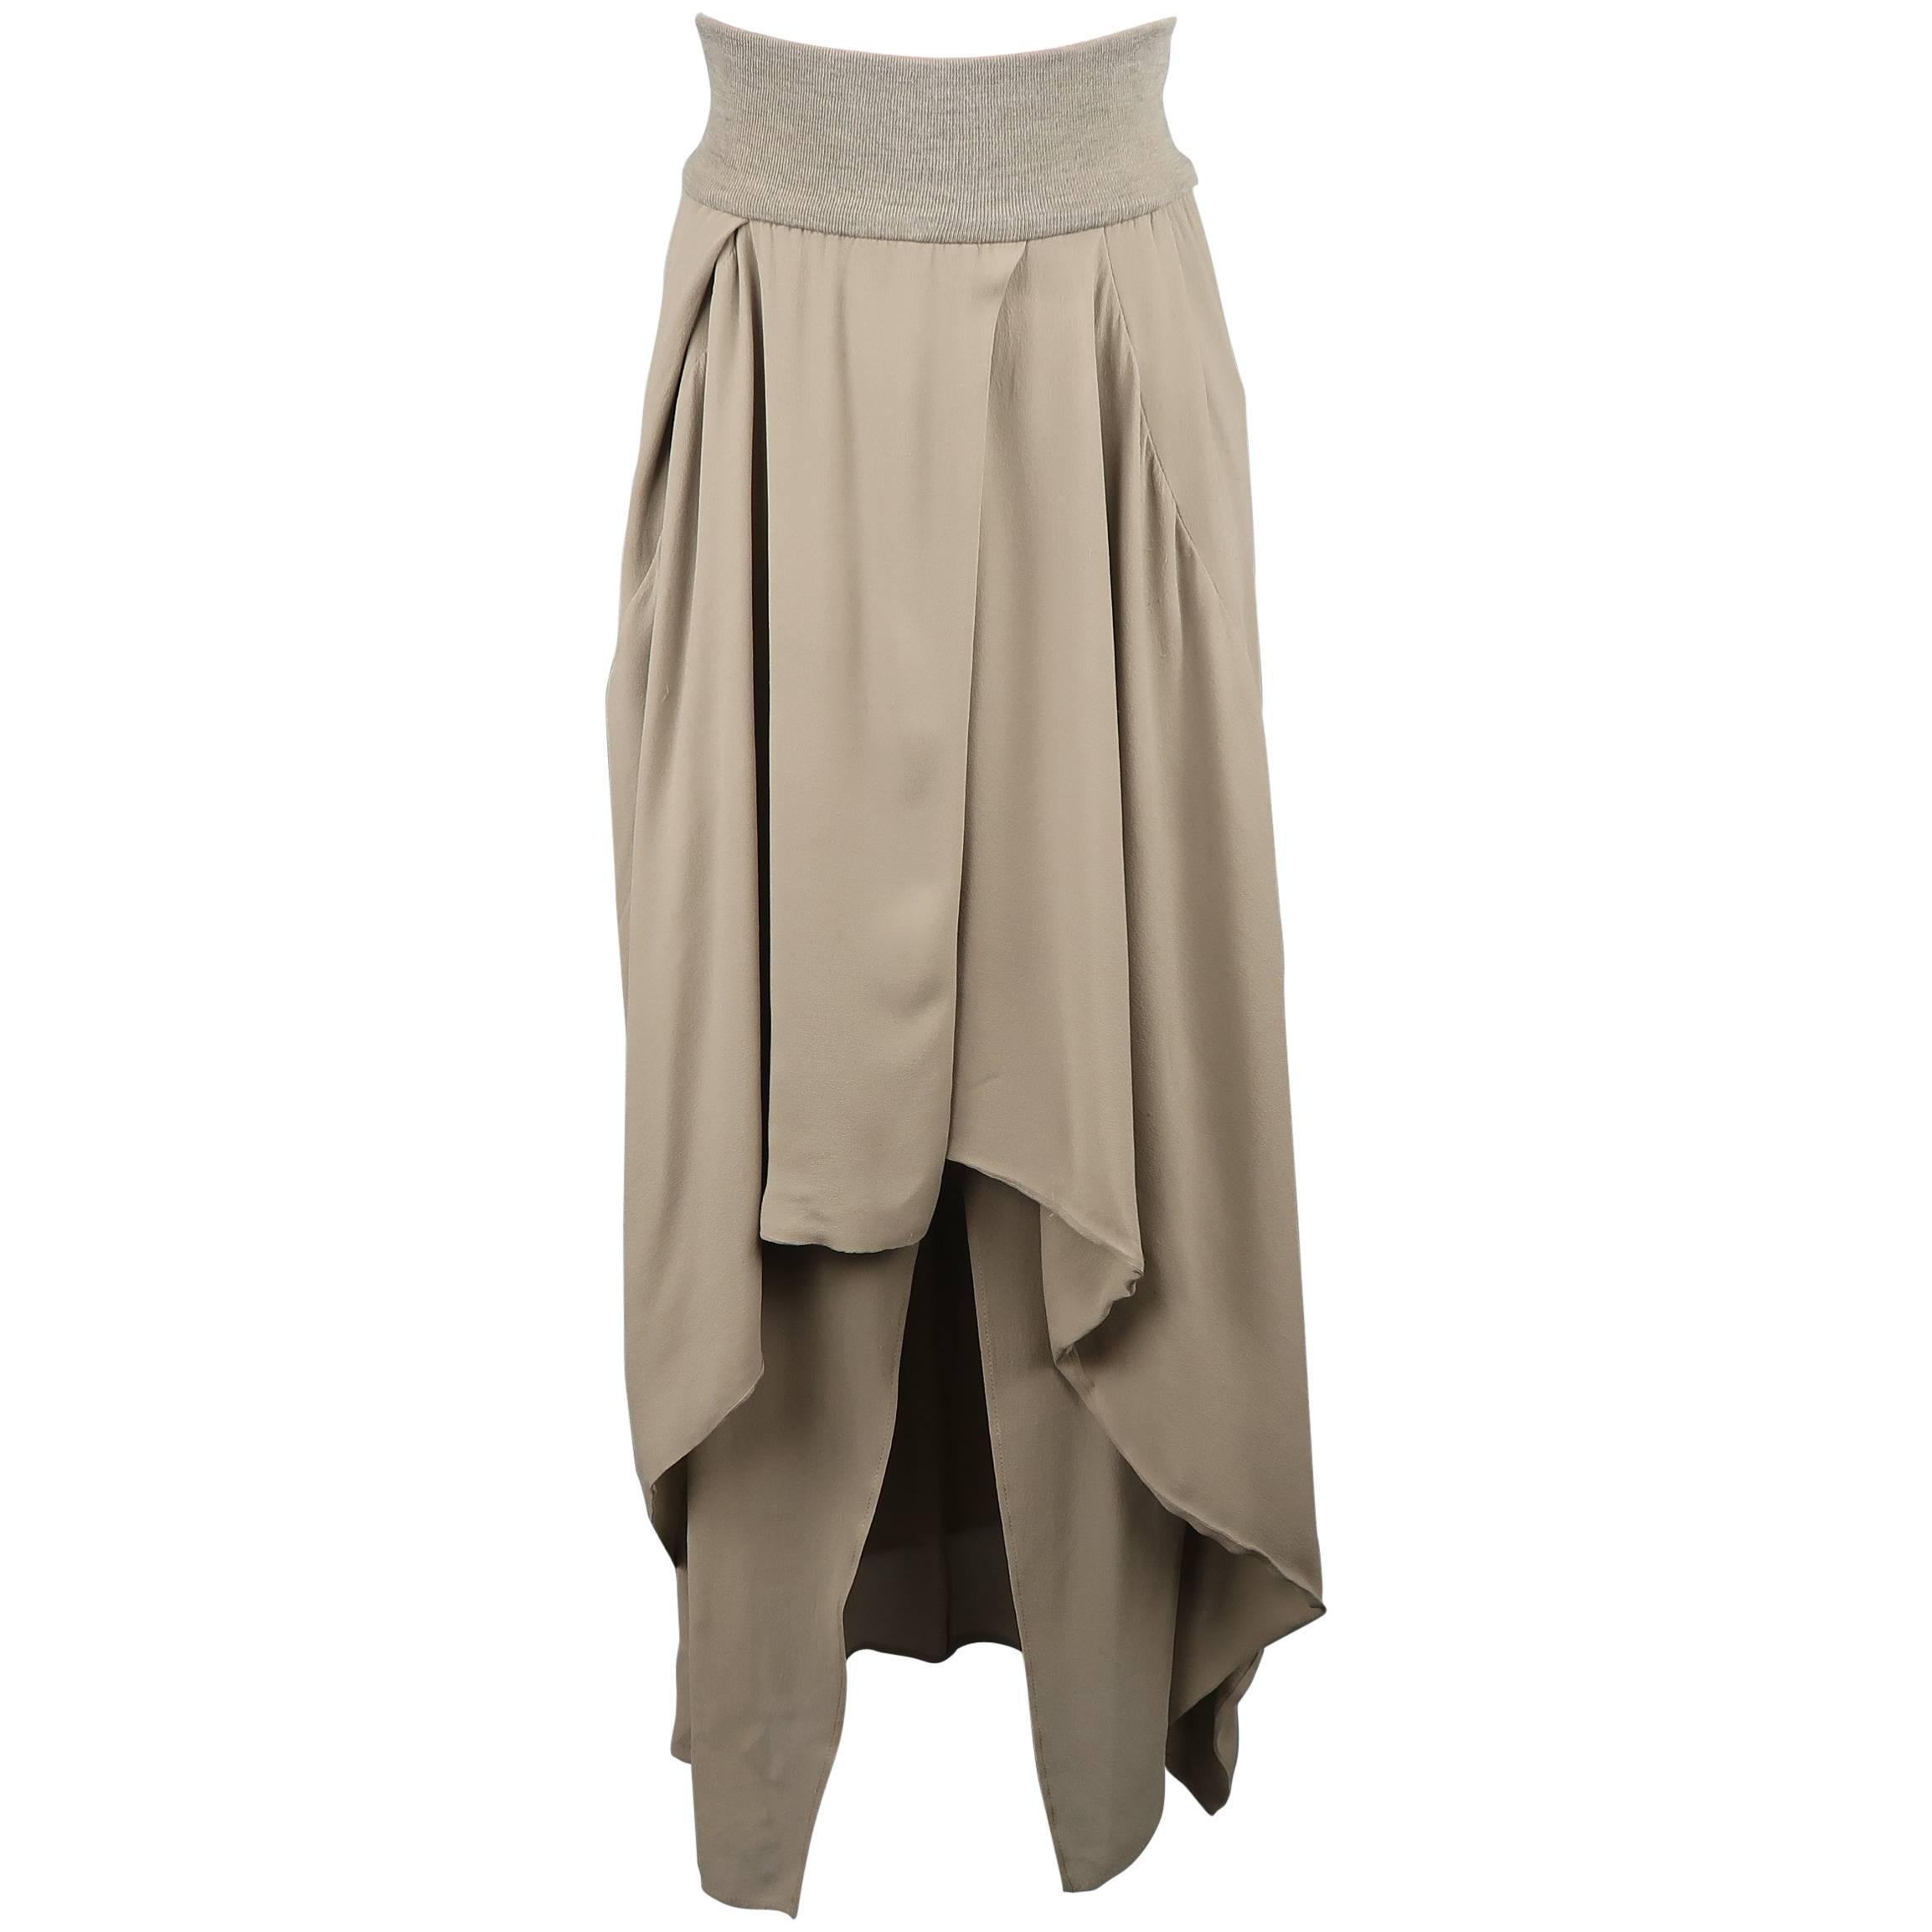 cc840fe1c Brunello Cucinelli Gray Silk Layered Drape High Low Skirt at 1stdibs